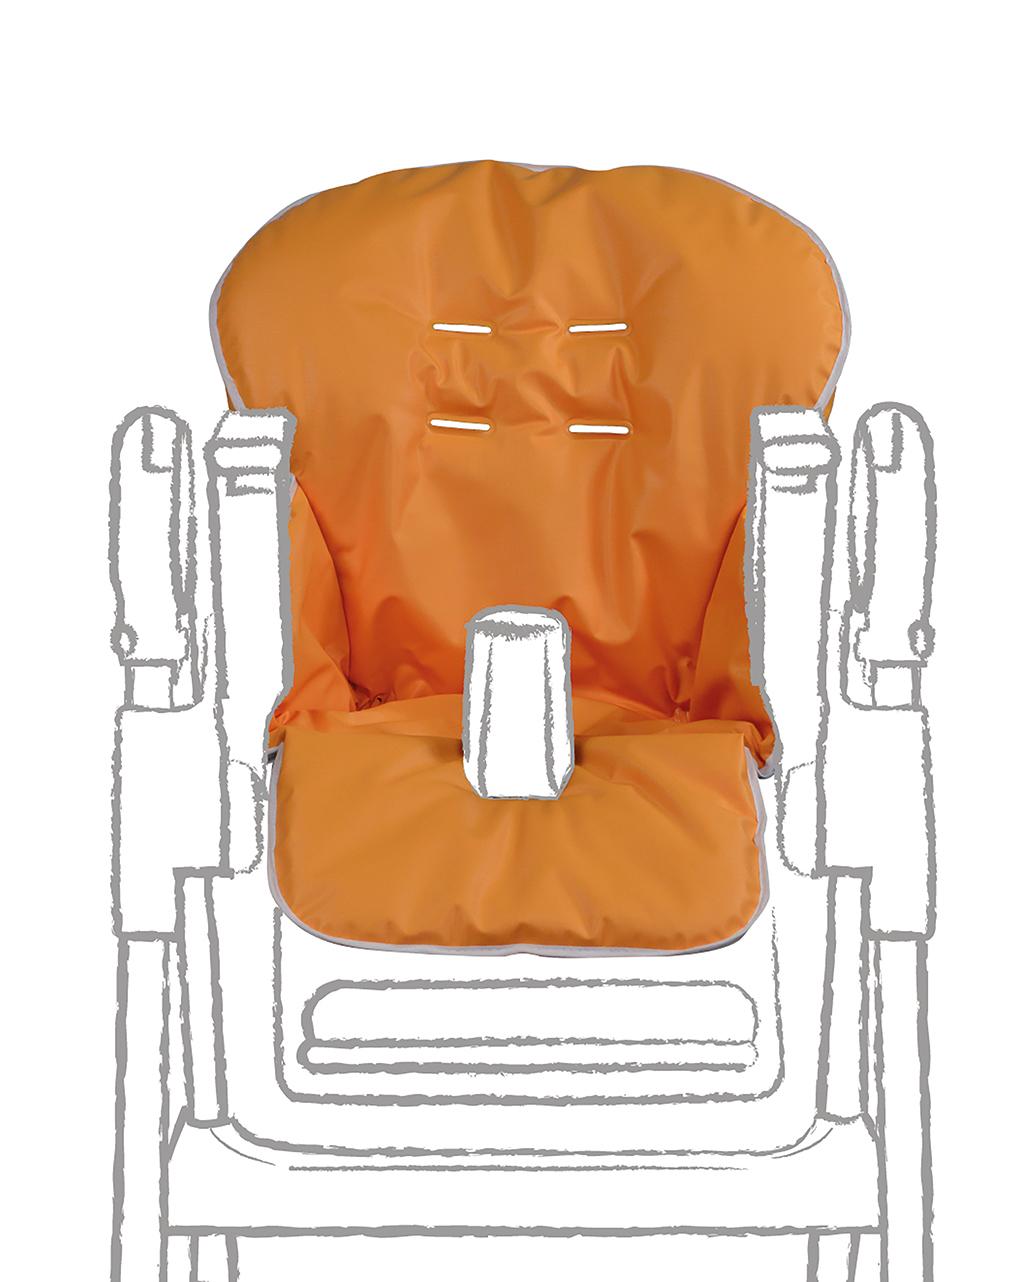 Capa para cadeira alta em pvc laranja - Giordani